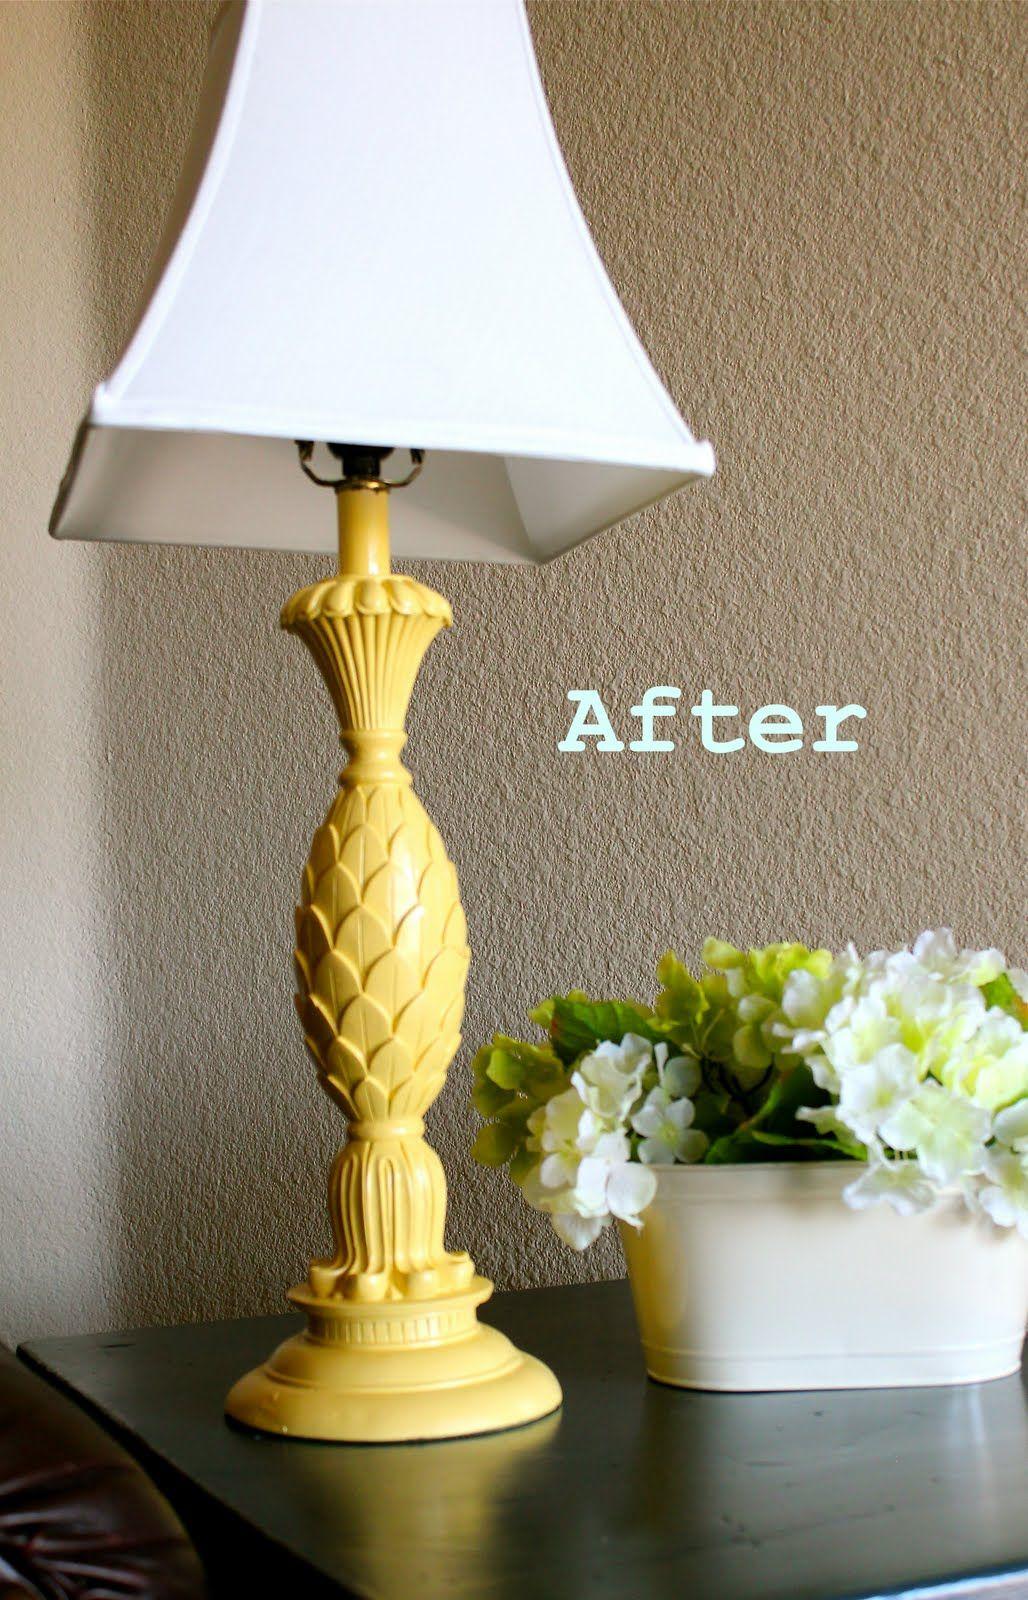 Yellow spray painted lamp makover remodelaholic for the home yellow spray painted lamp makover remodelaholic aloadofball Choice Image